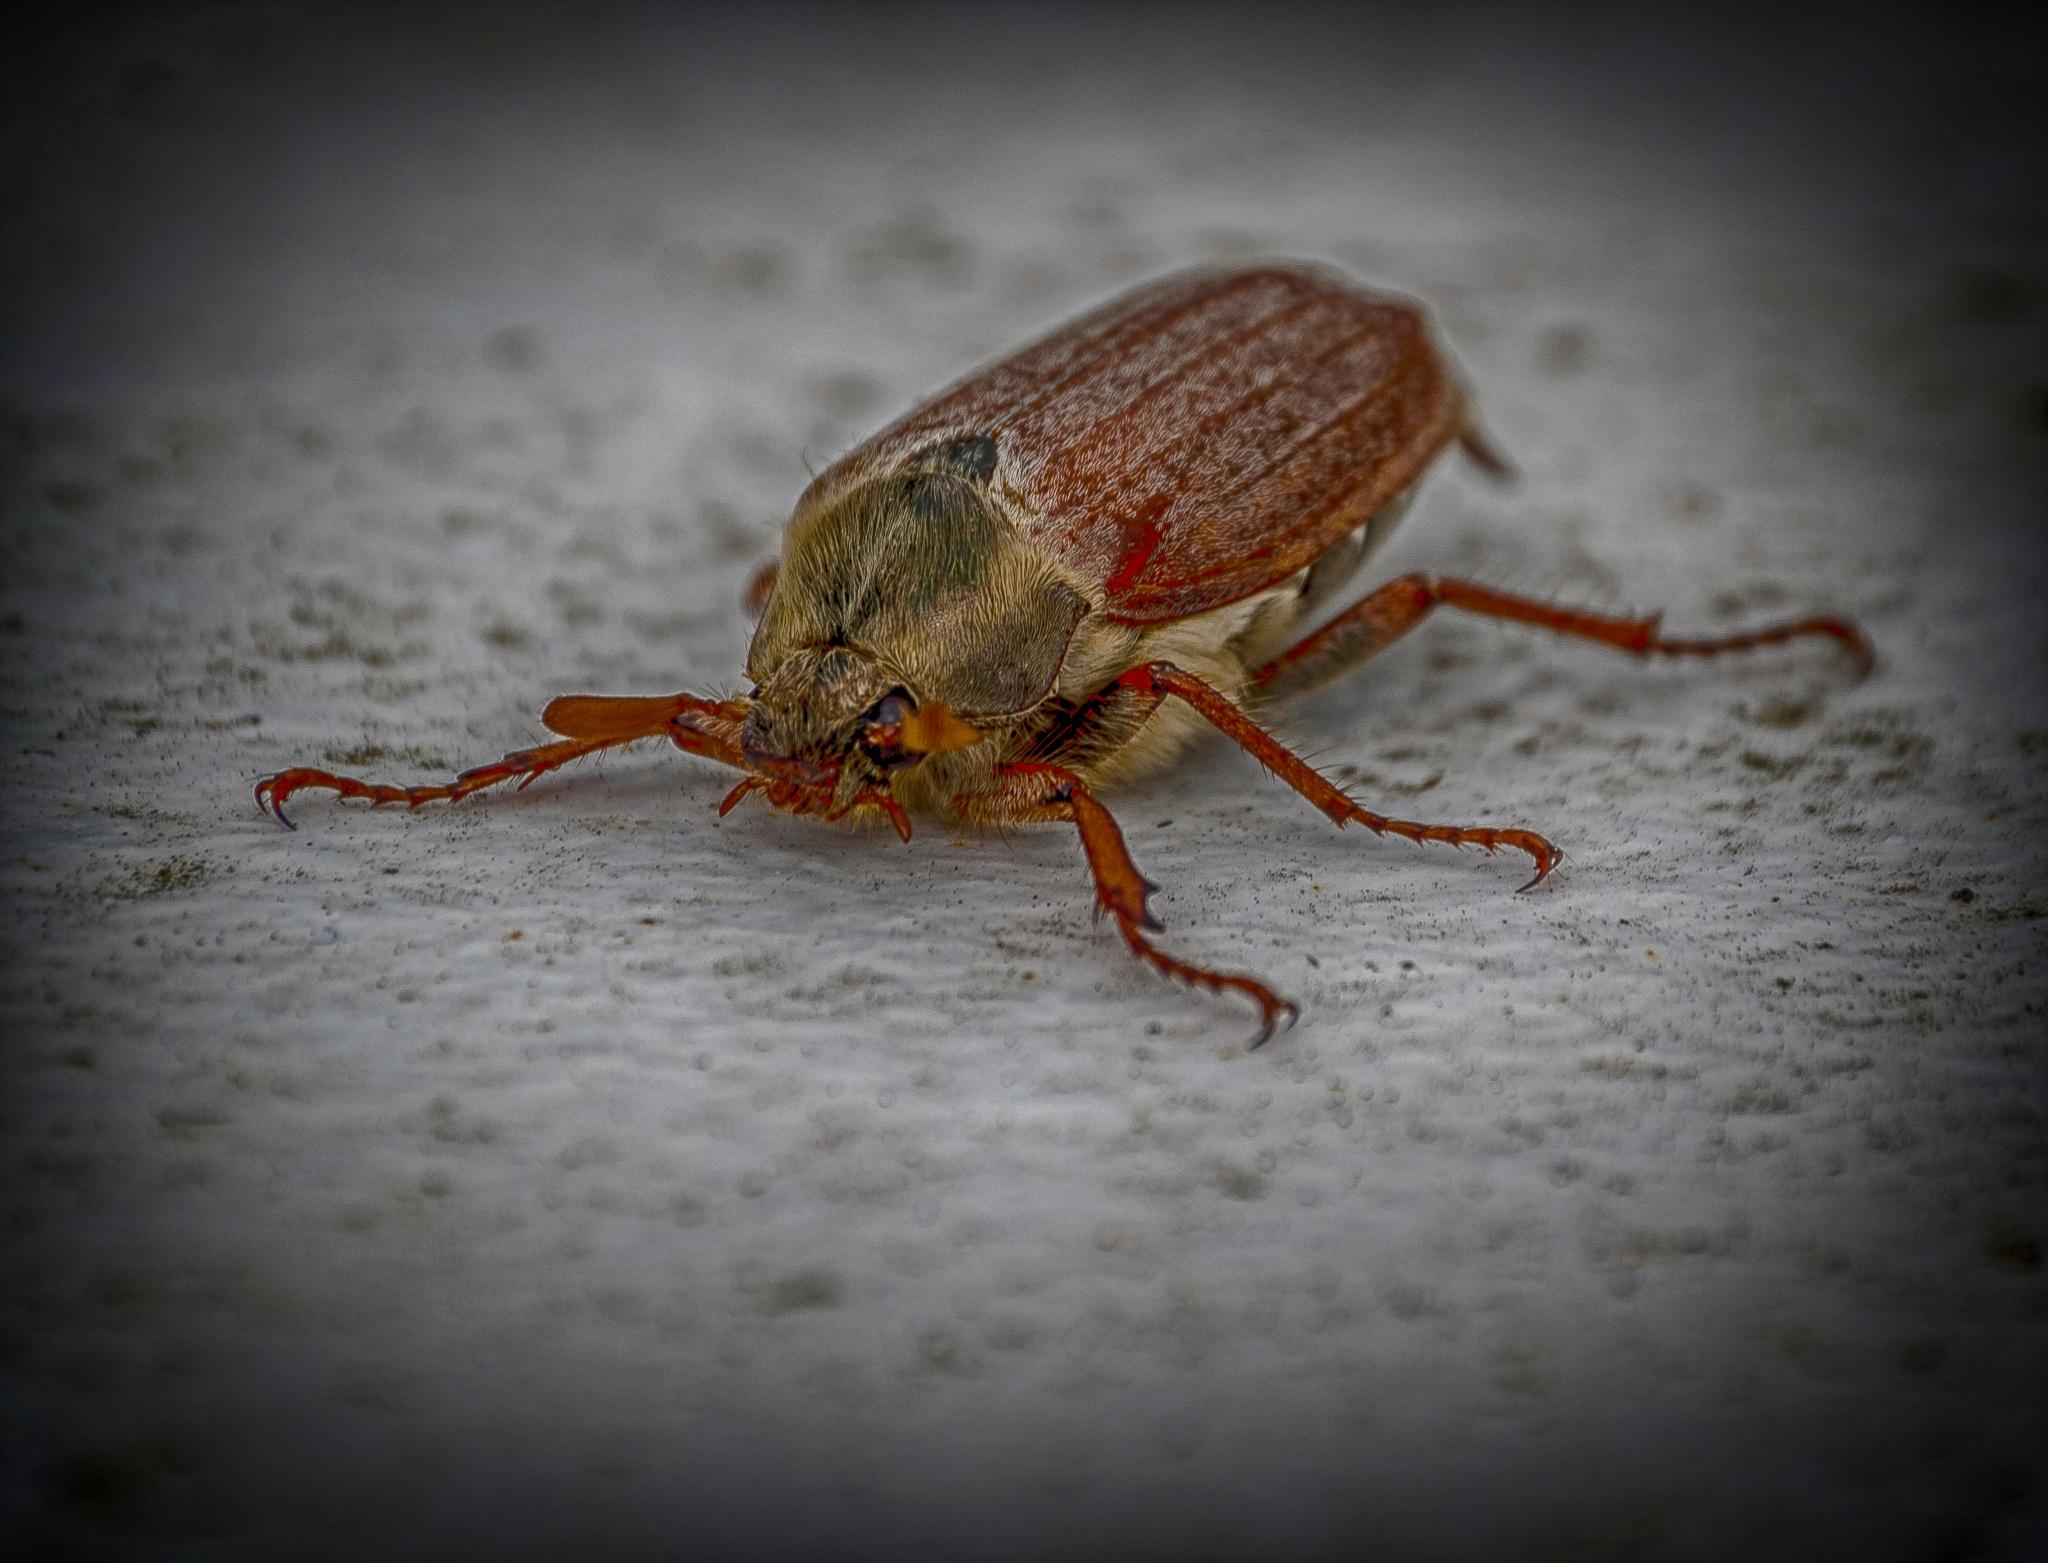 Cockchafer Beetle by Ian Gardner